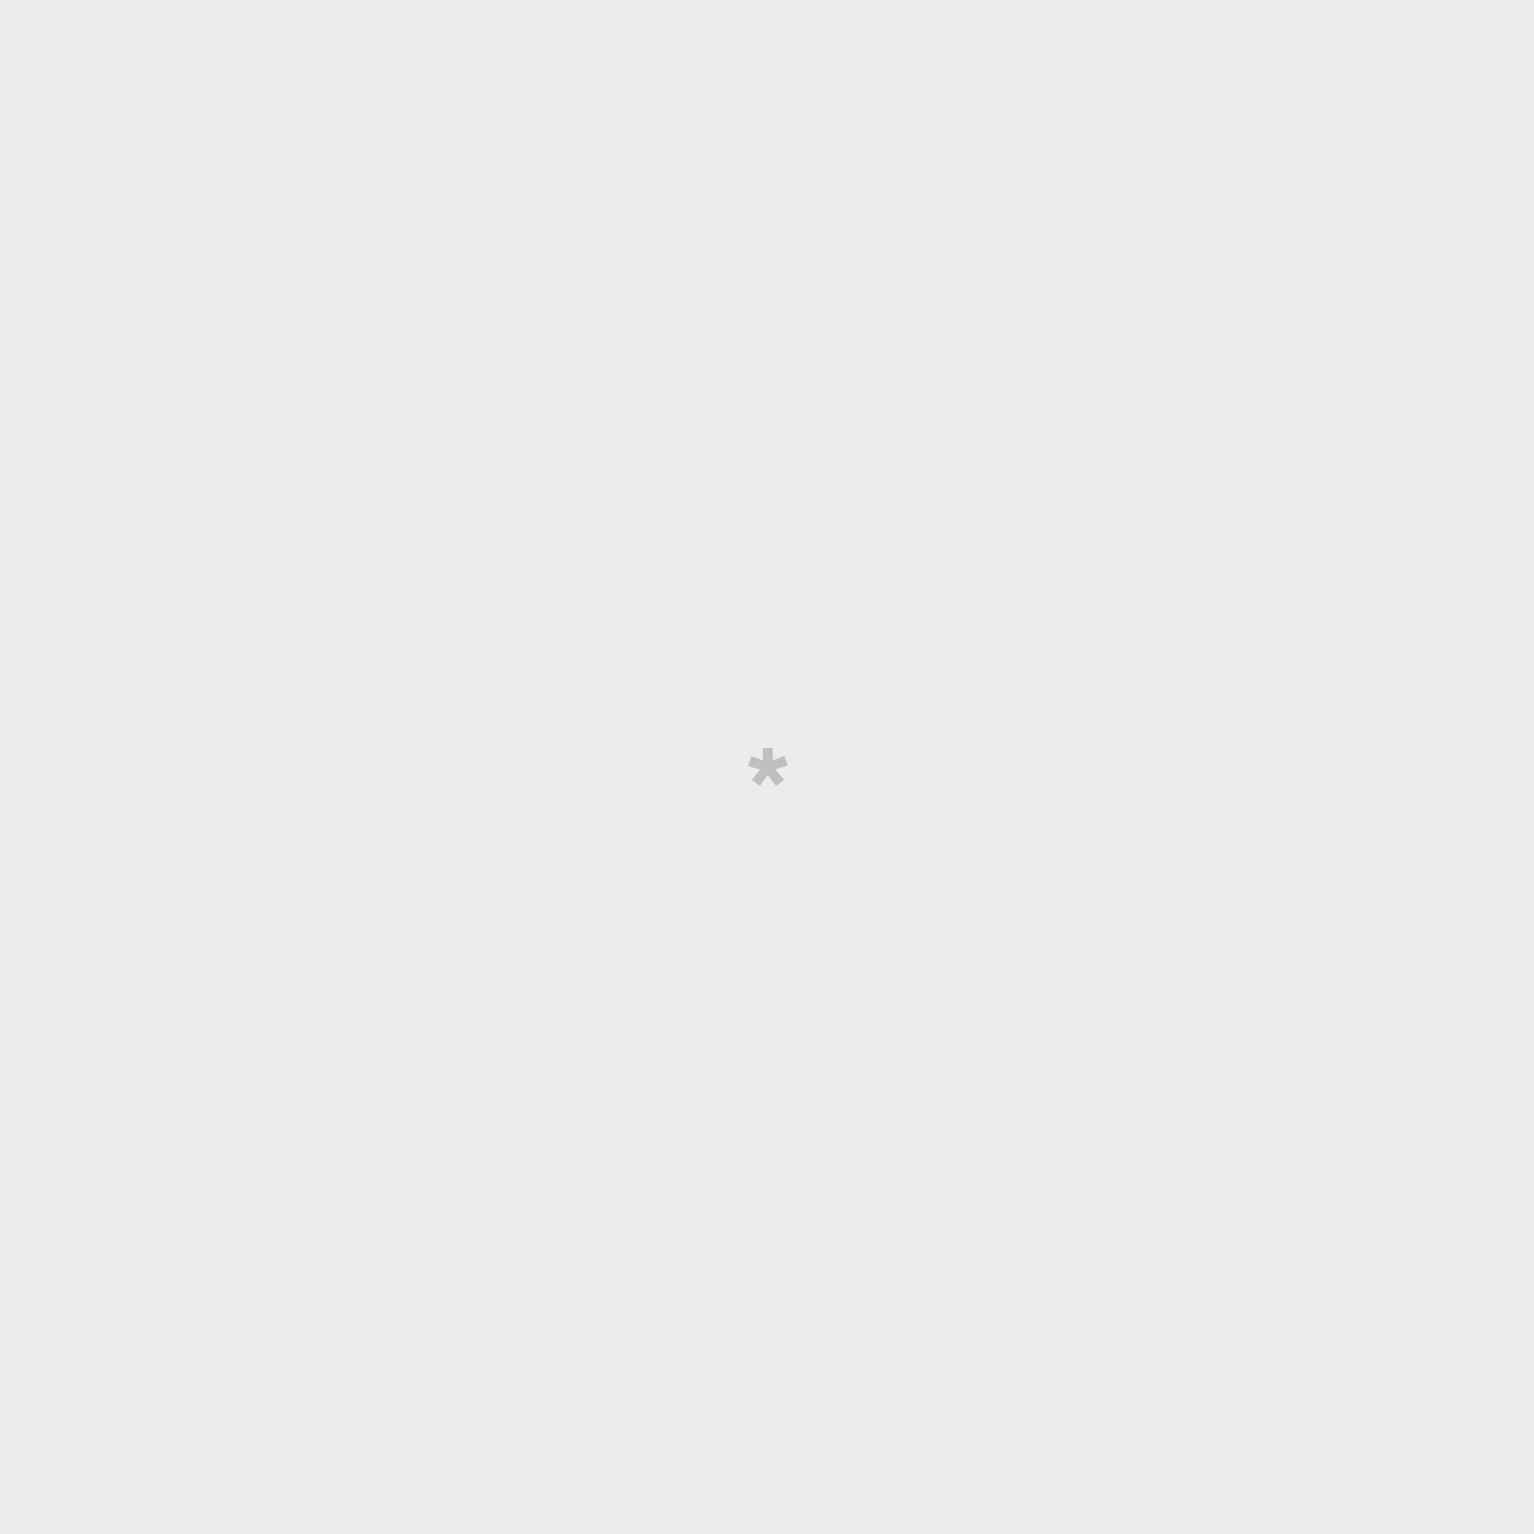 Paraguas grande transparente - Sonrisas por todos  lados